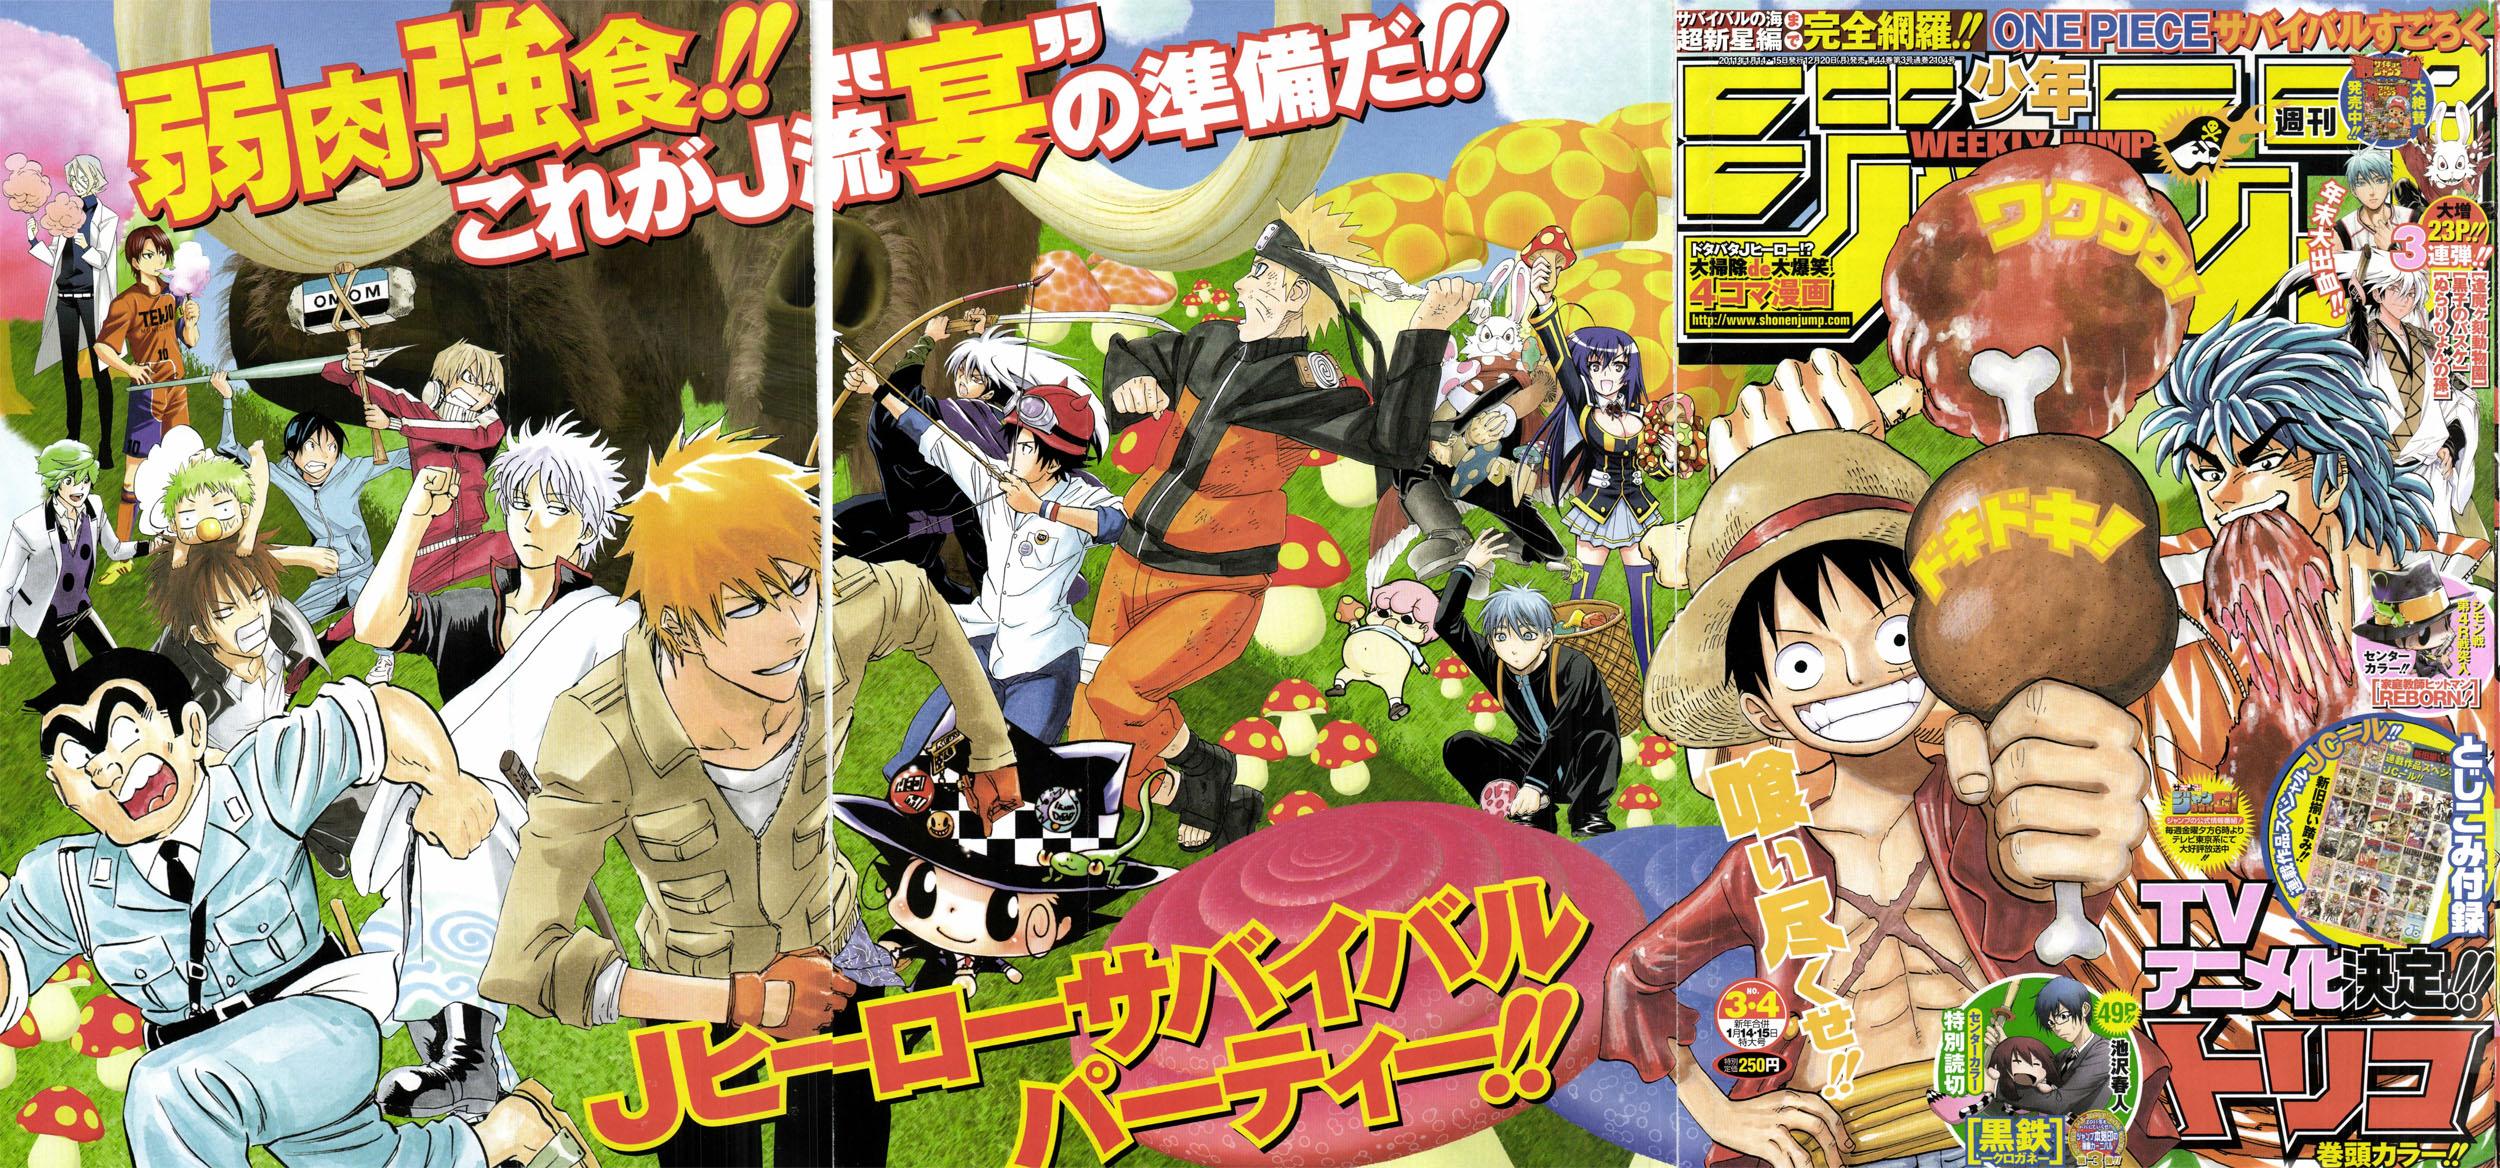 2011-Weekly Shonen Jump #03.04-2011b.jpg